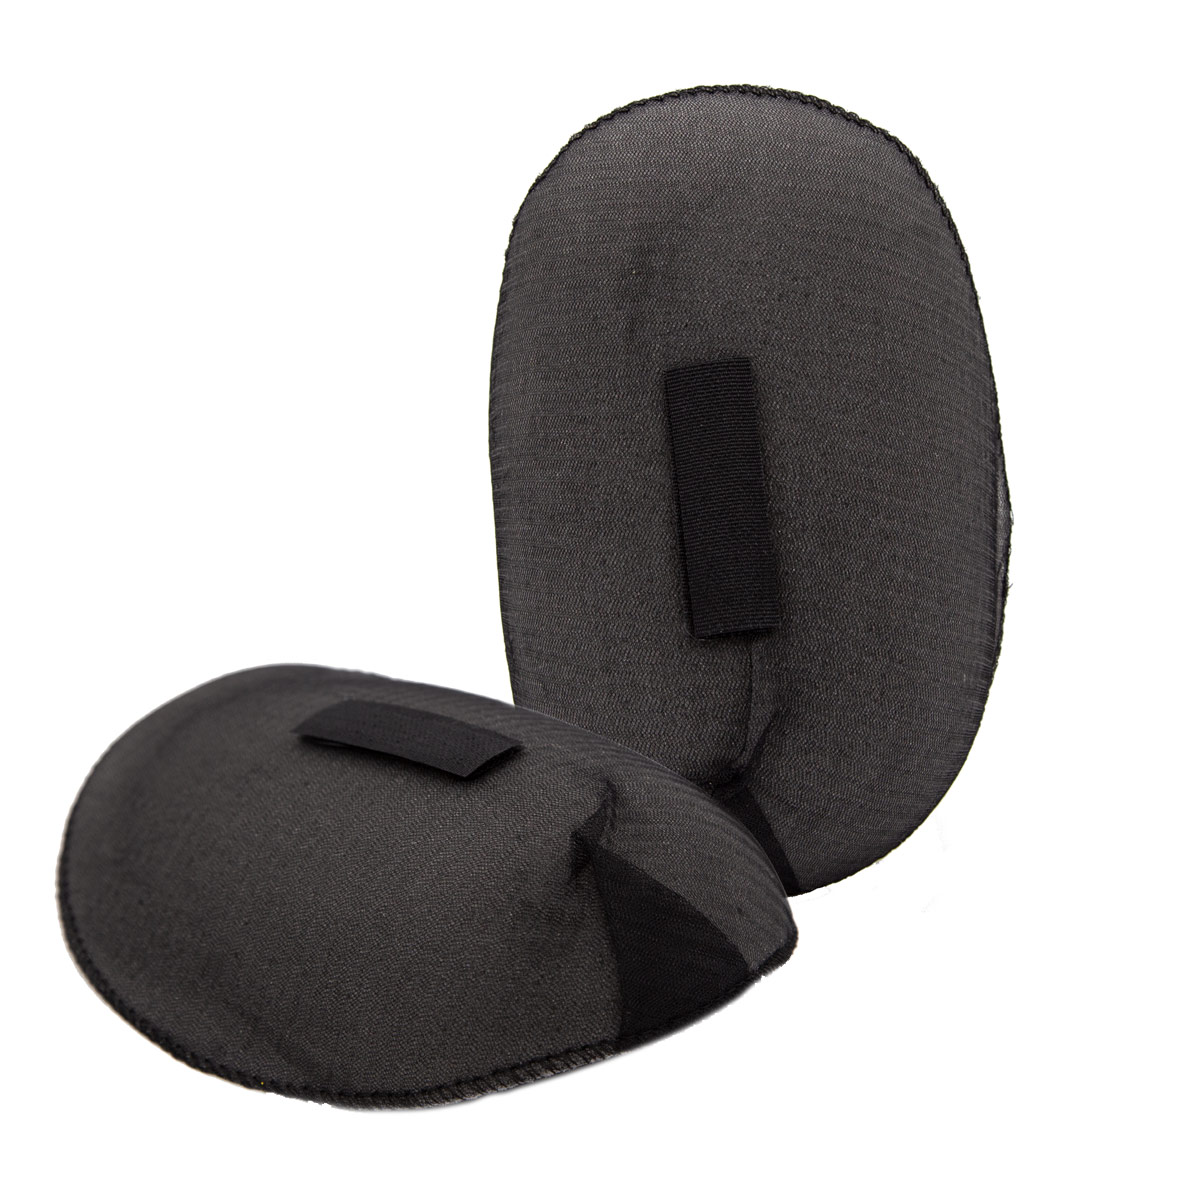 РК-15/А Плечевые накладки реглан обшитые с контлентой, 15*165*110мм Hobby&Pro